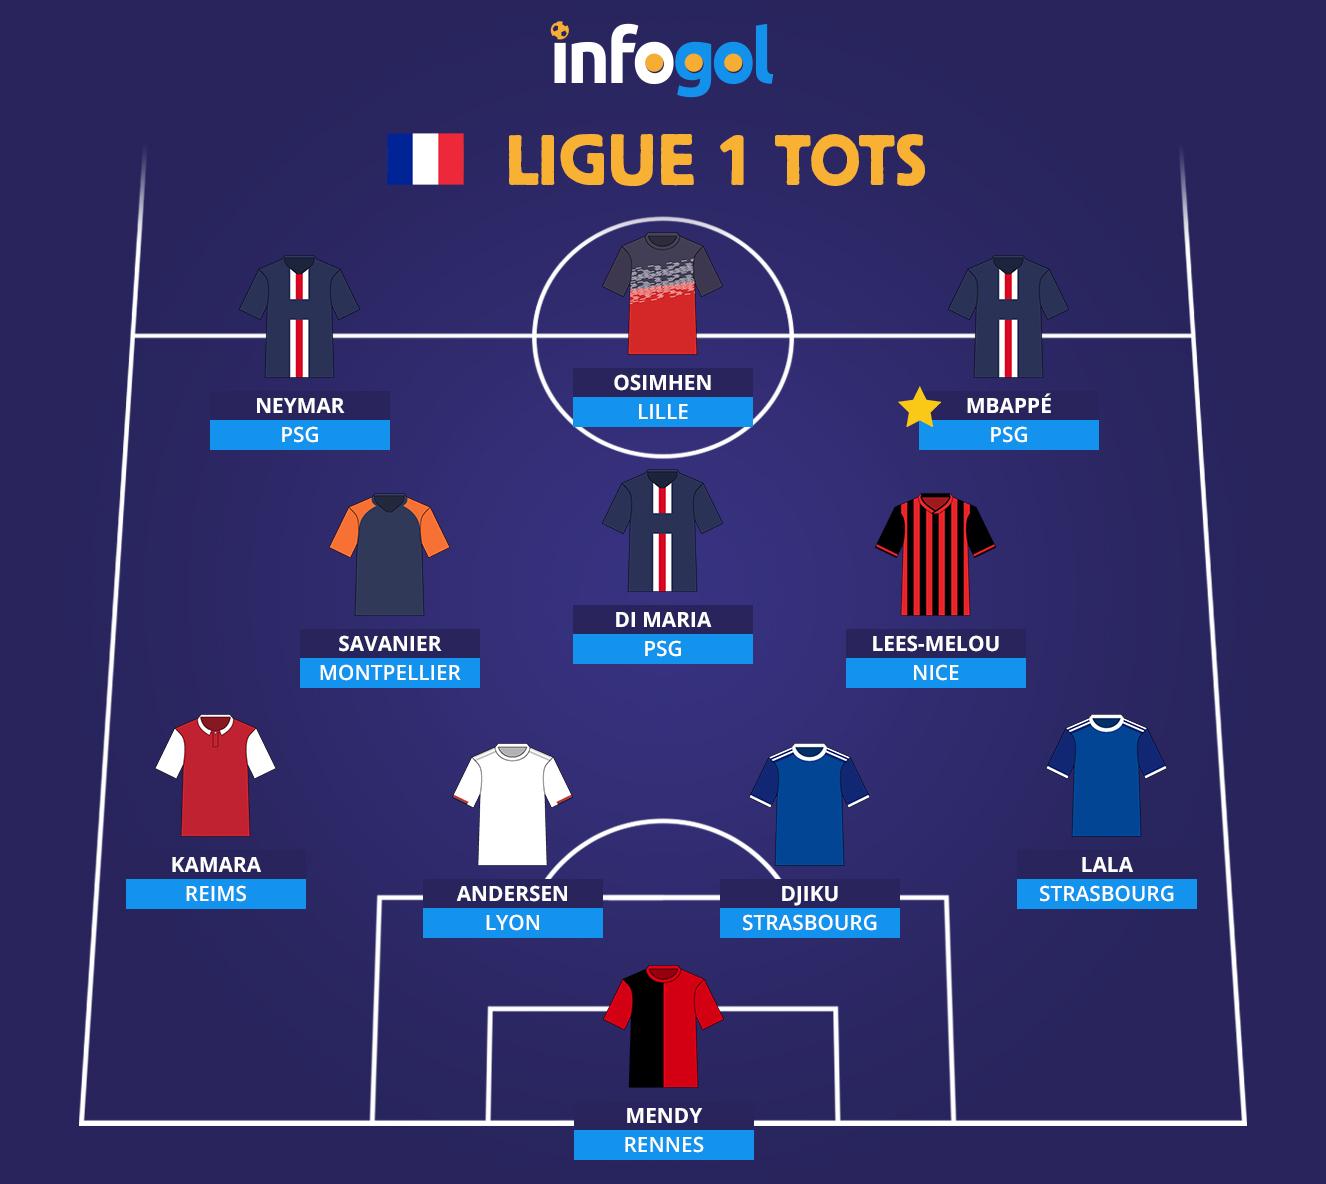 France Ligue 1 Team Of The Season 19 20 Including Kylian Mbappe And Neymar Jr Reviews Infogol